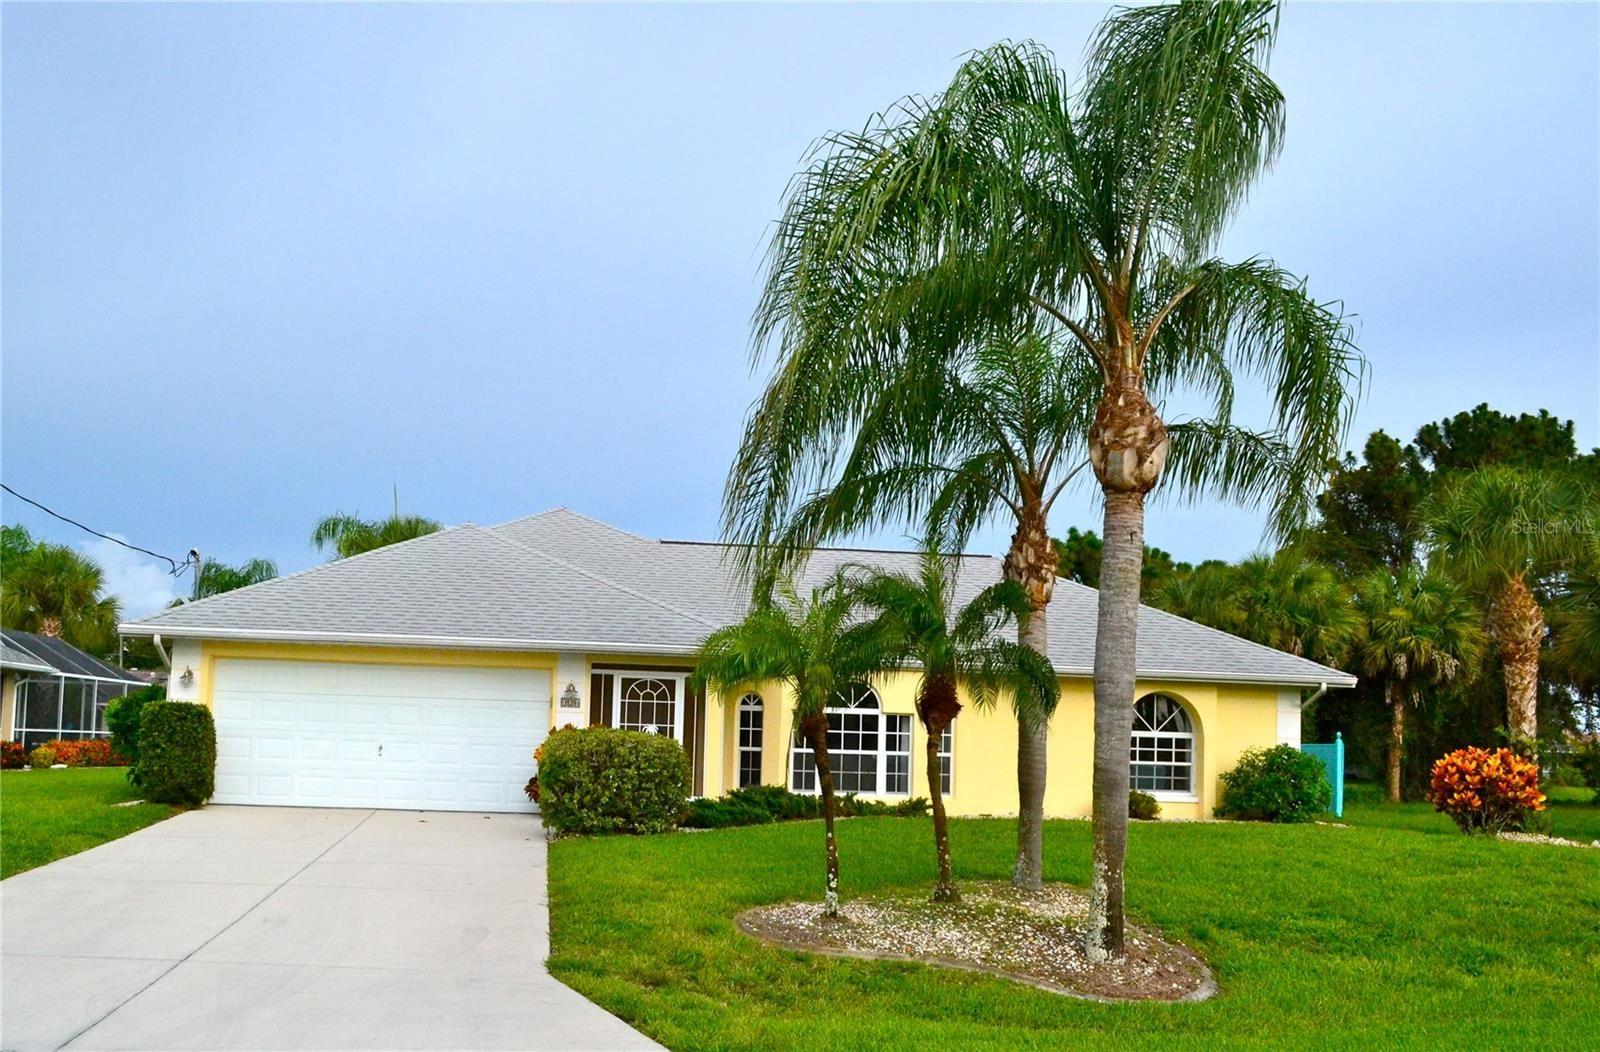 Photo of 126 LONG MEADOW LANE, ROTONDA WEST, FL 33947 (MLS # D6120141)